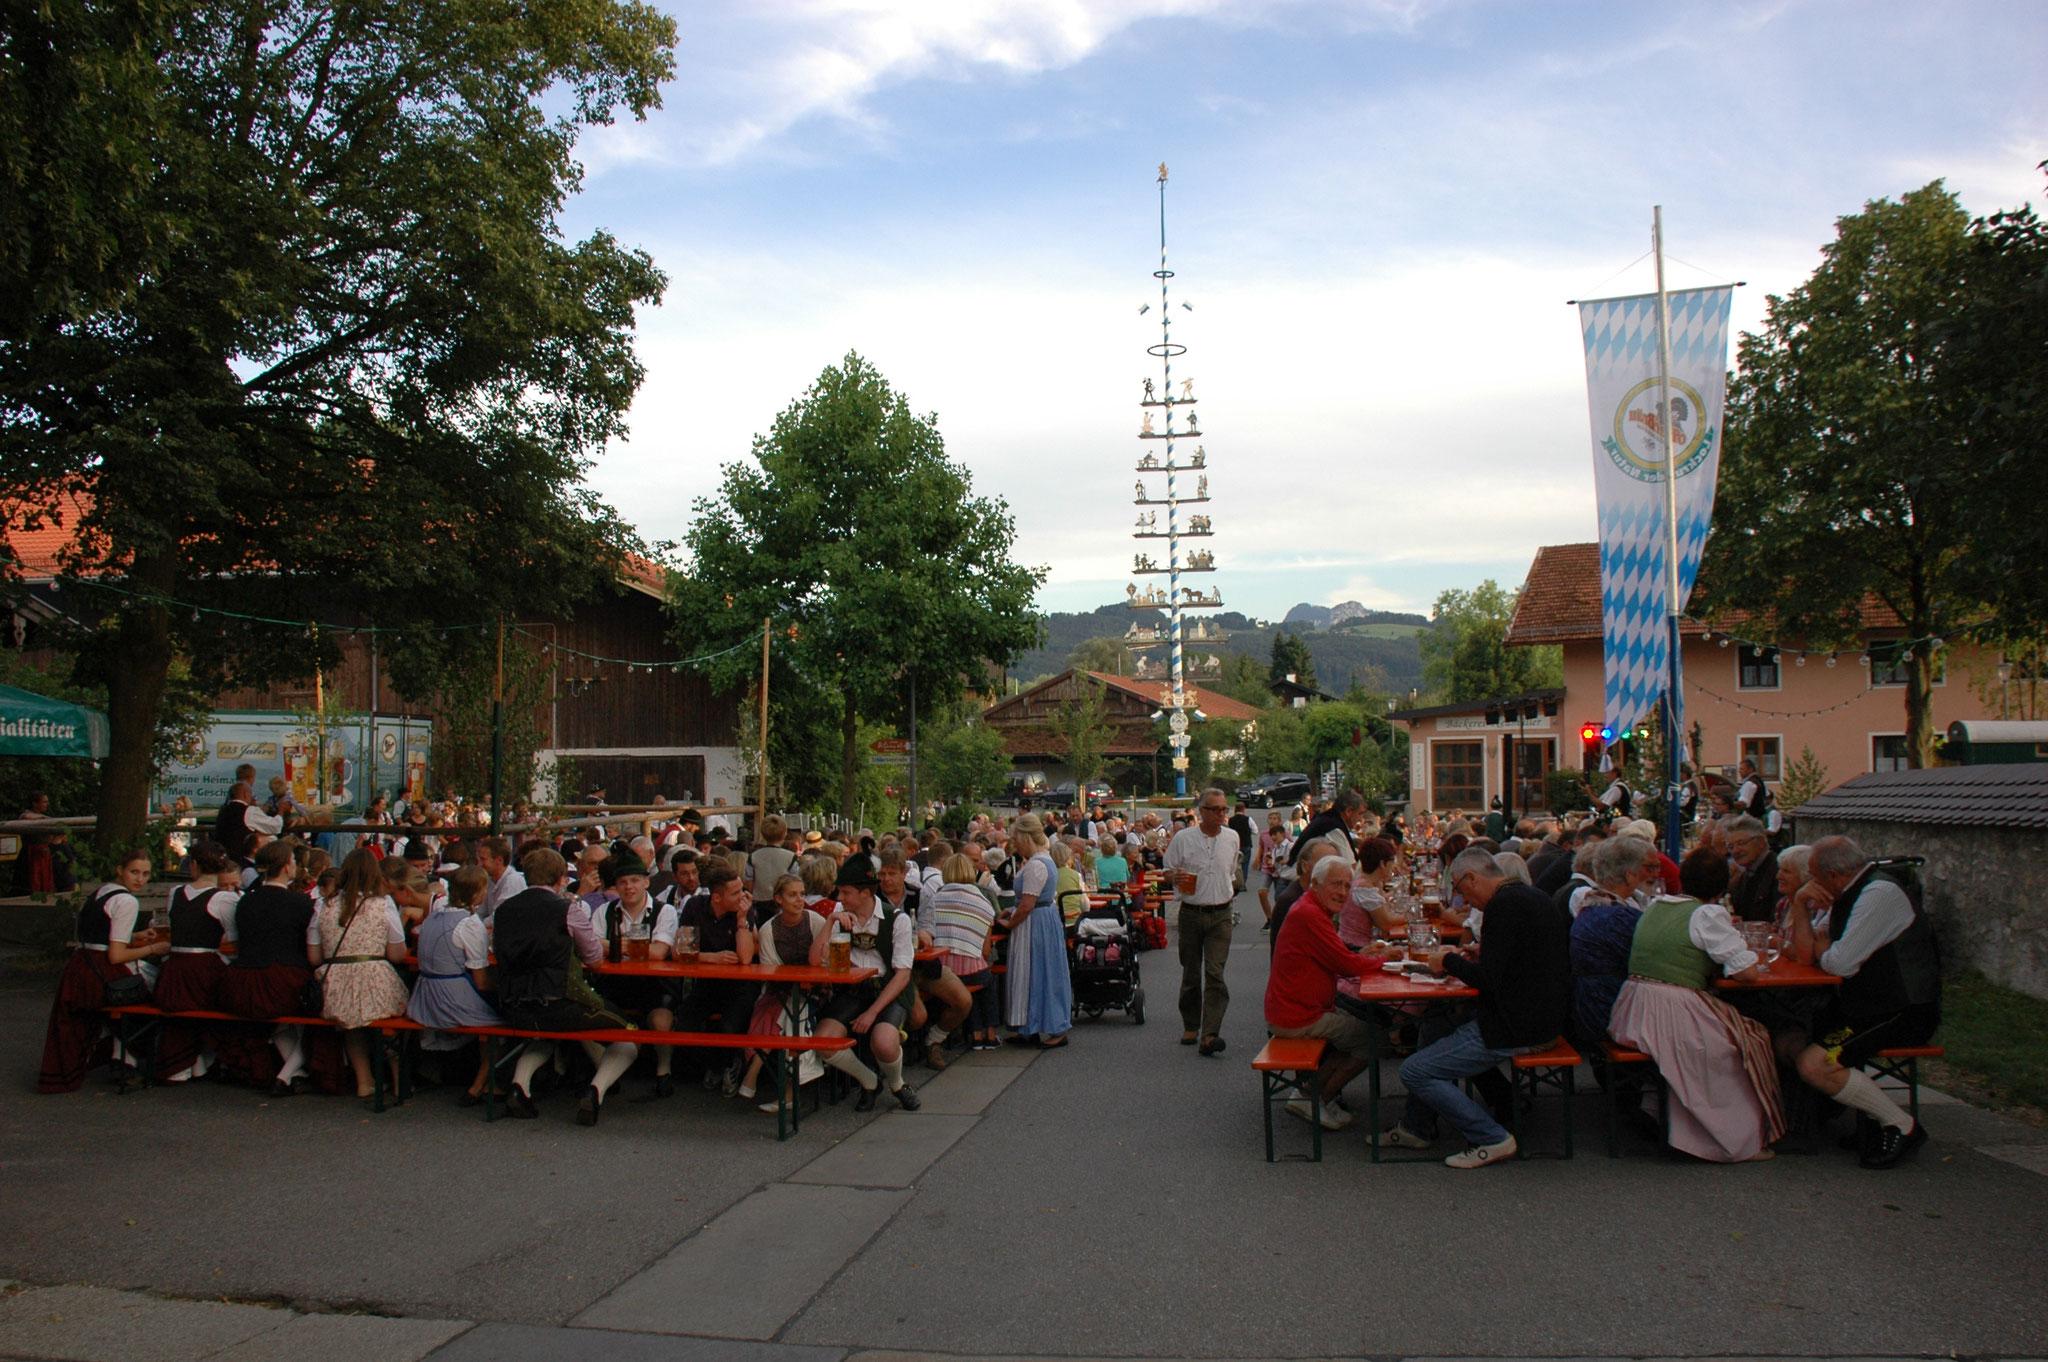 Dorffest Lauterbach Trachtenverein D'Lindntaler Lauterbach